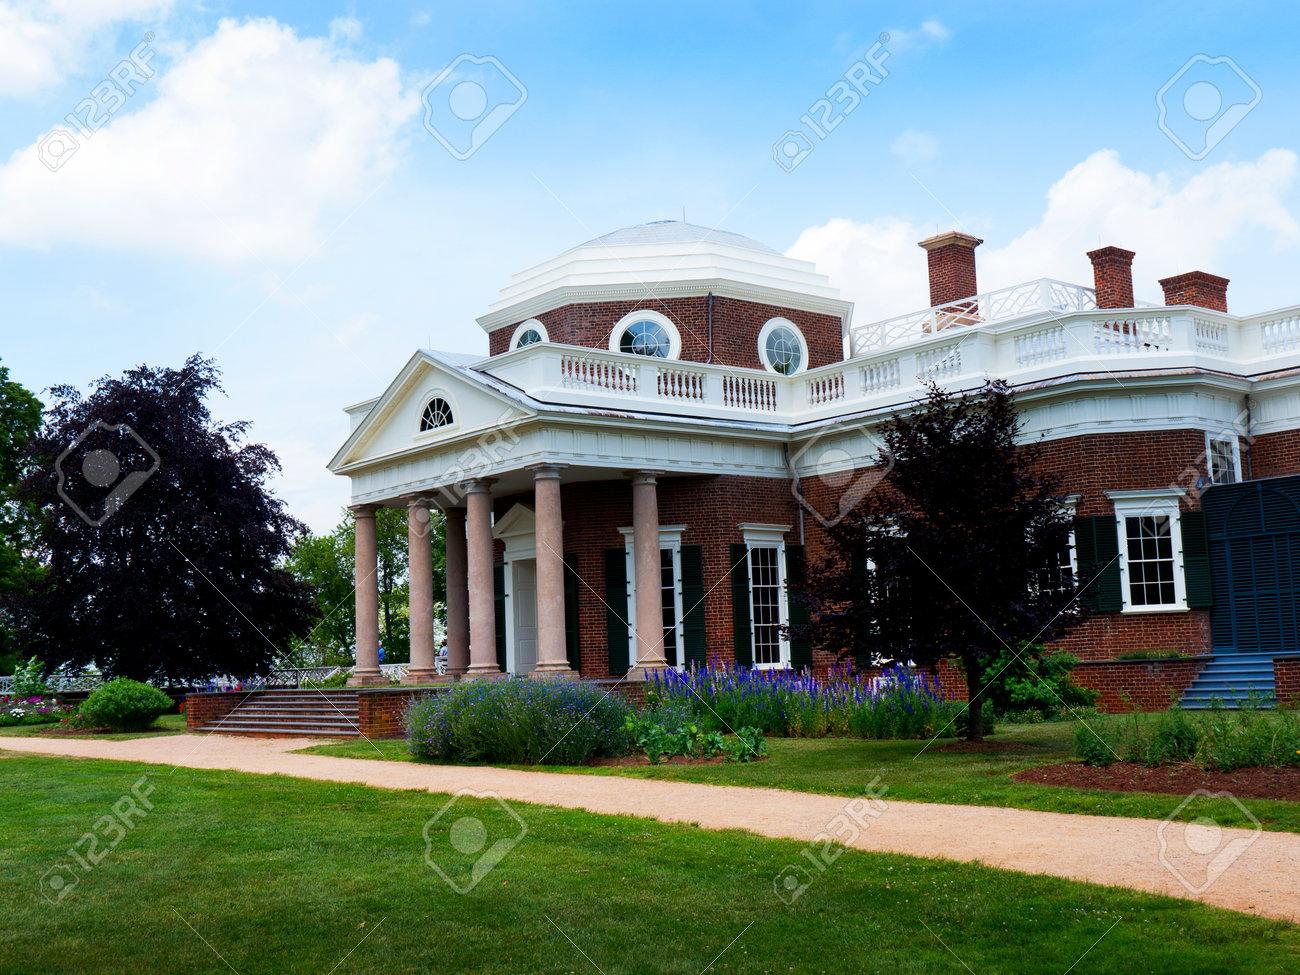 Monticello model house